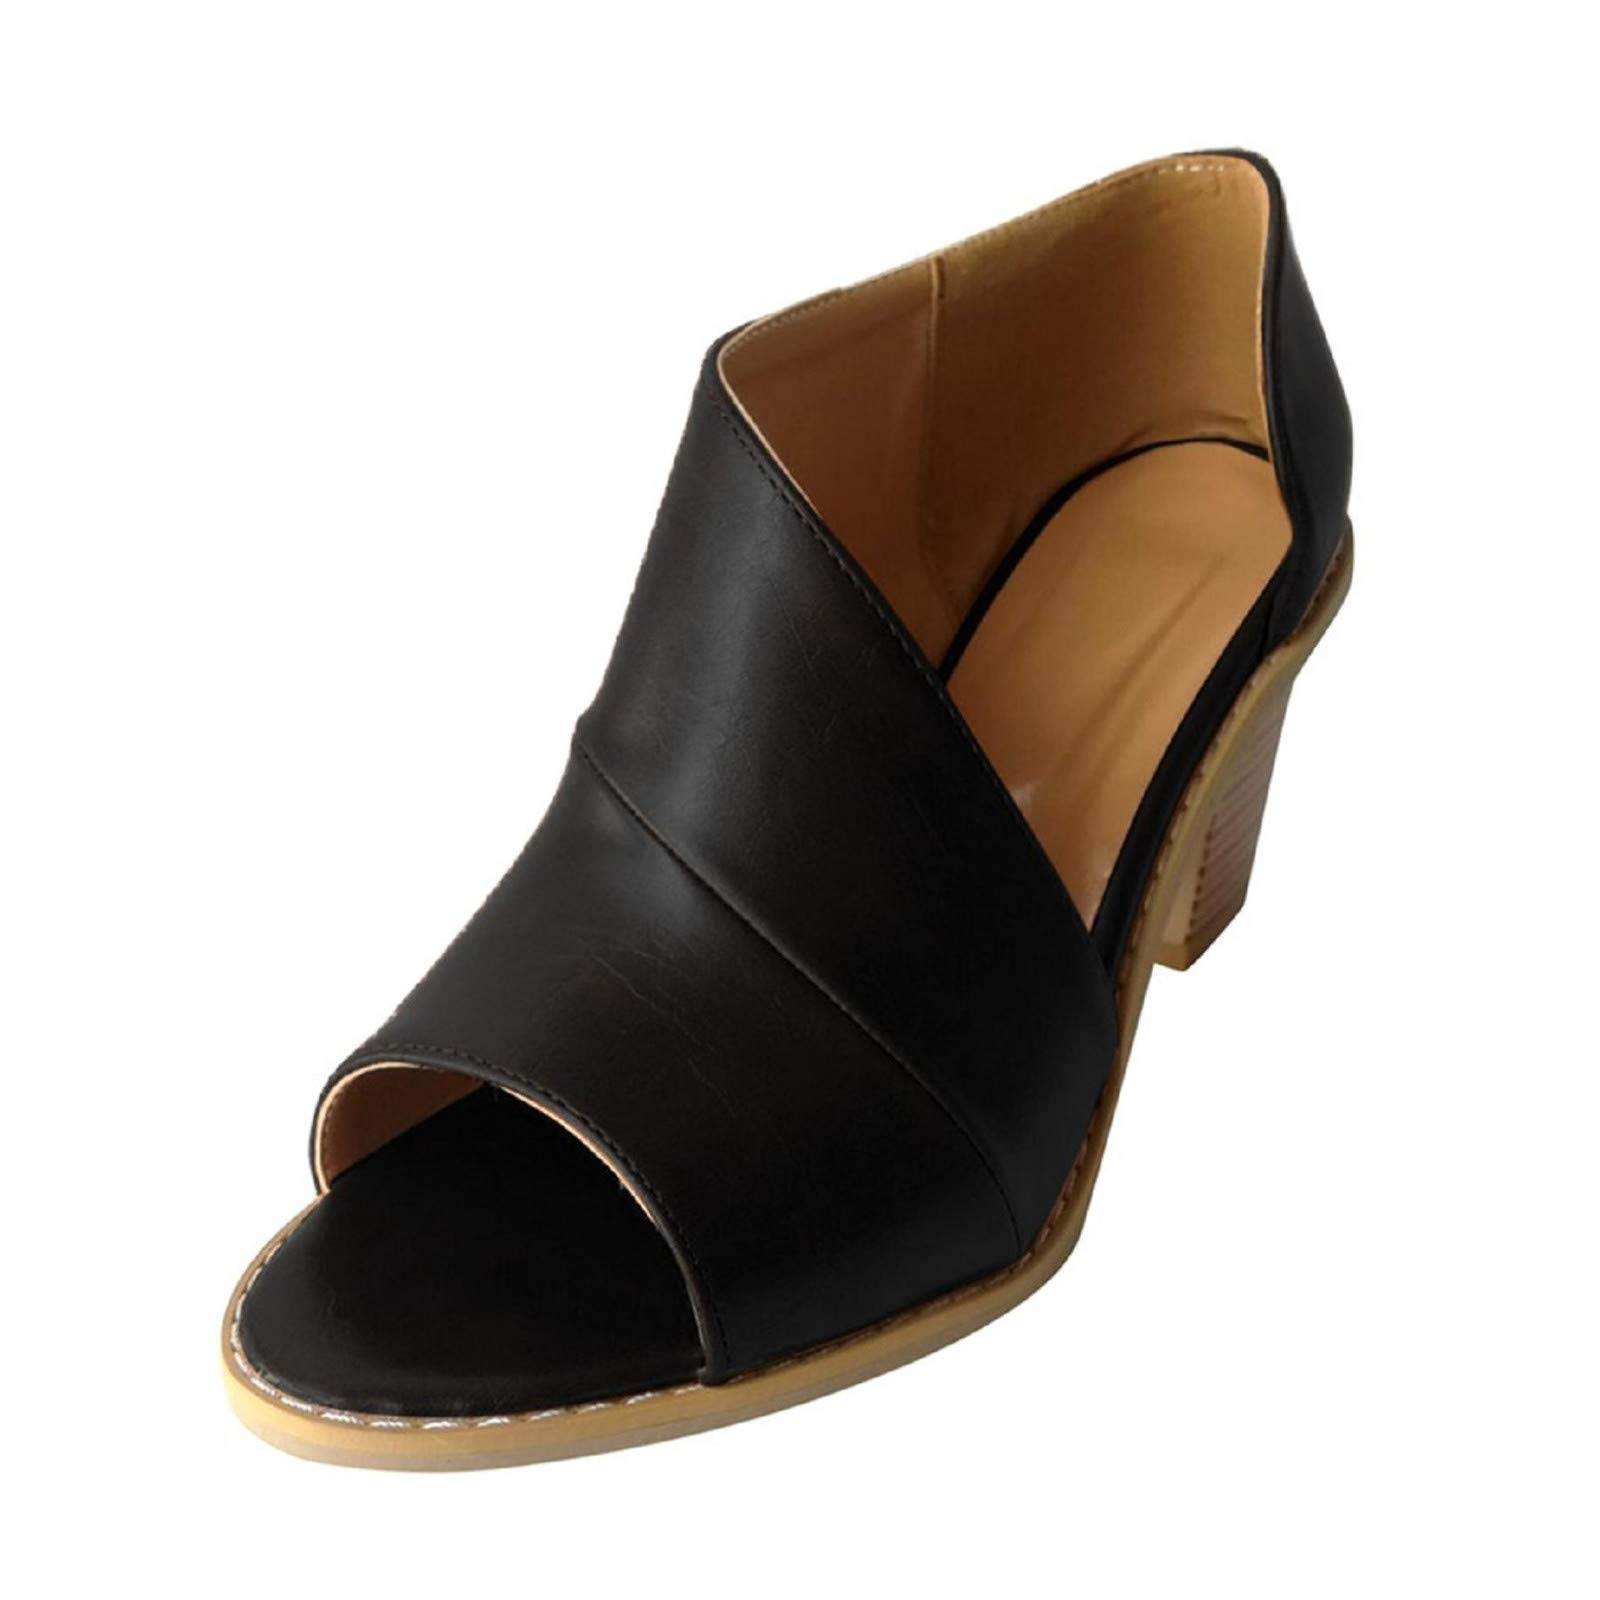 Womens Peep Toe Chunky Block Heel Sandals Casual Slip On Side Cutout D'Orsay Shoes Black